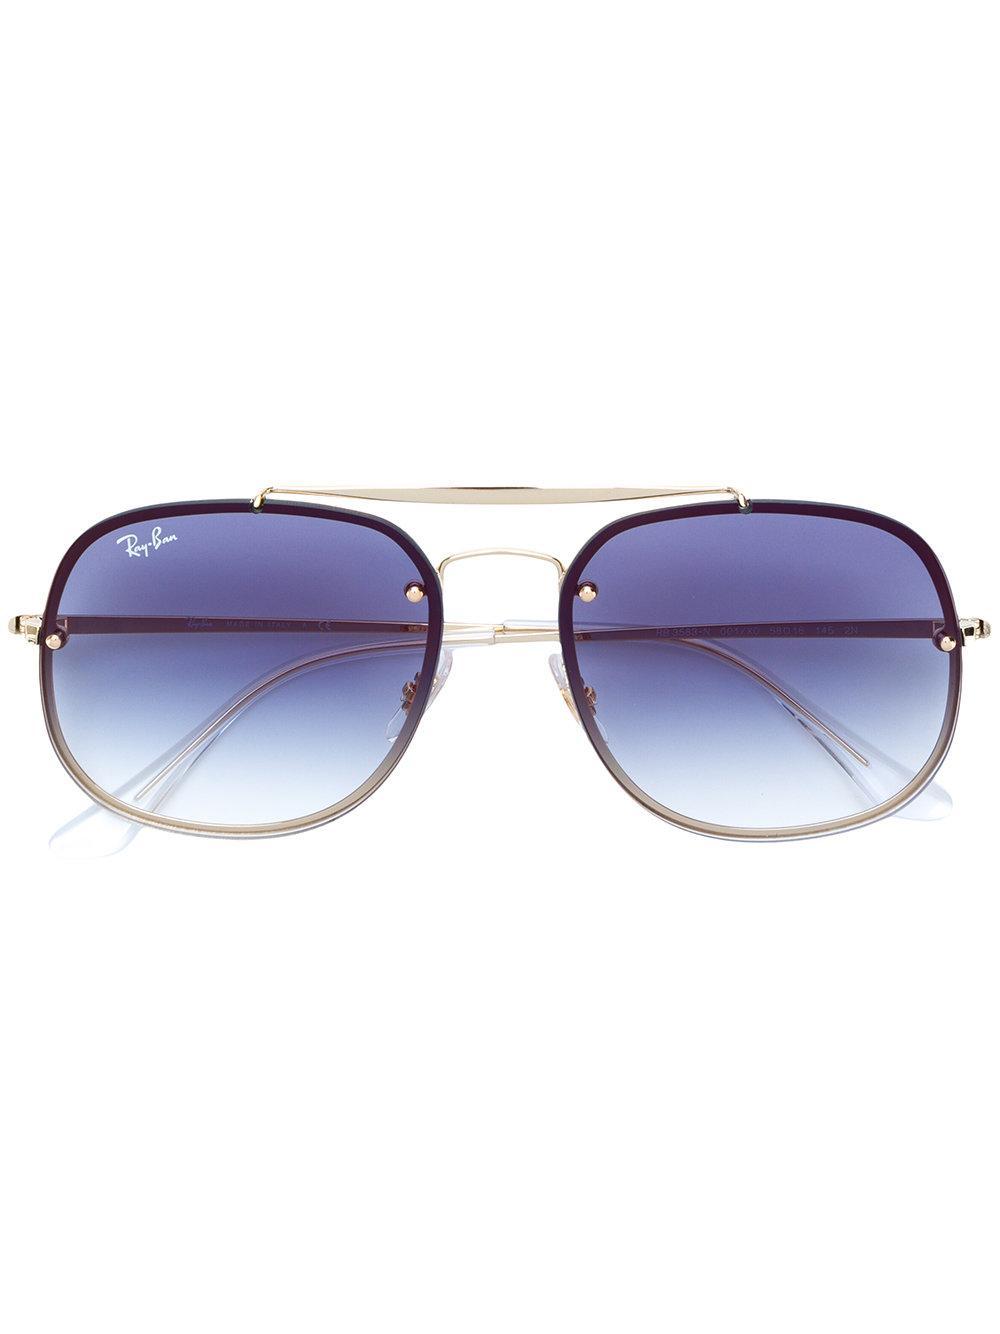 Ray Ban Ray-ban Aviator Style Gradient Lens Sunglasses - Metallic